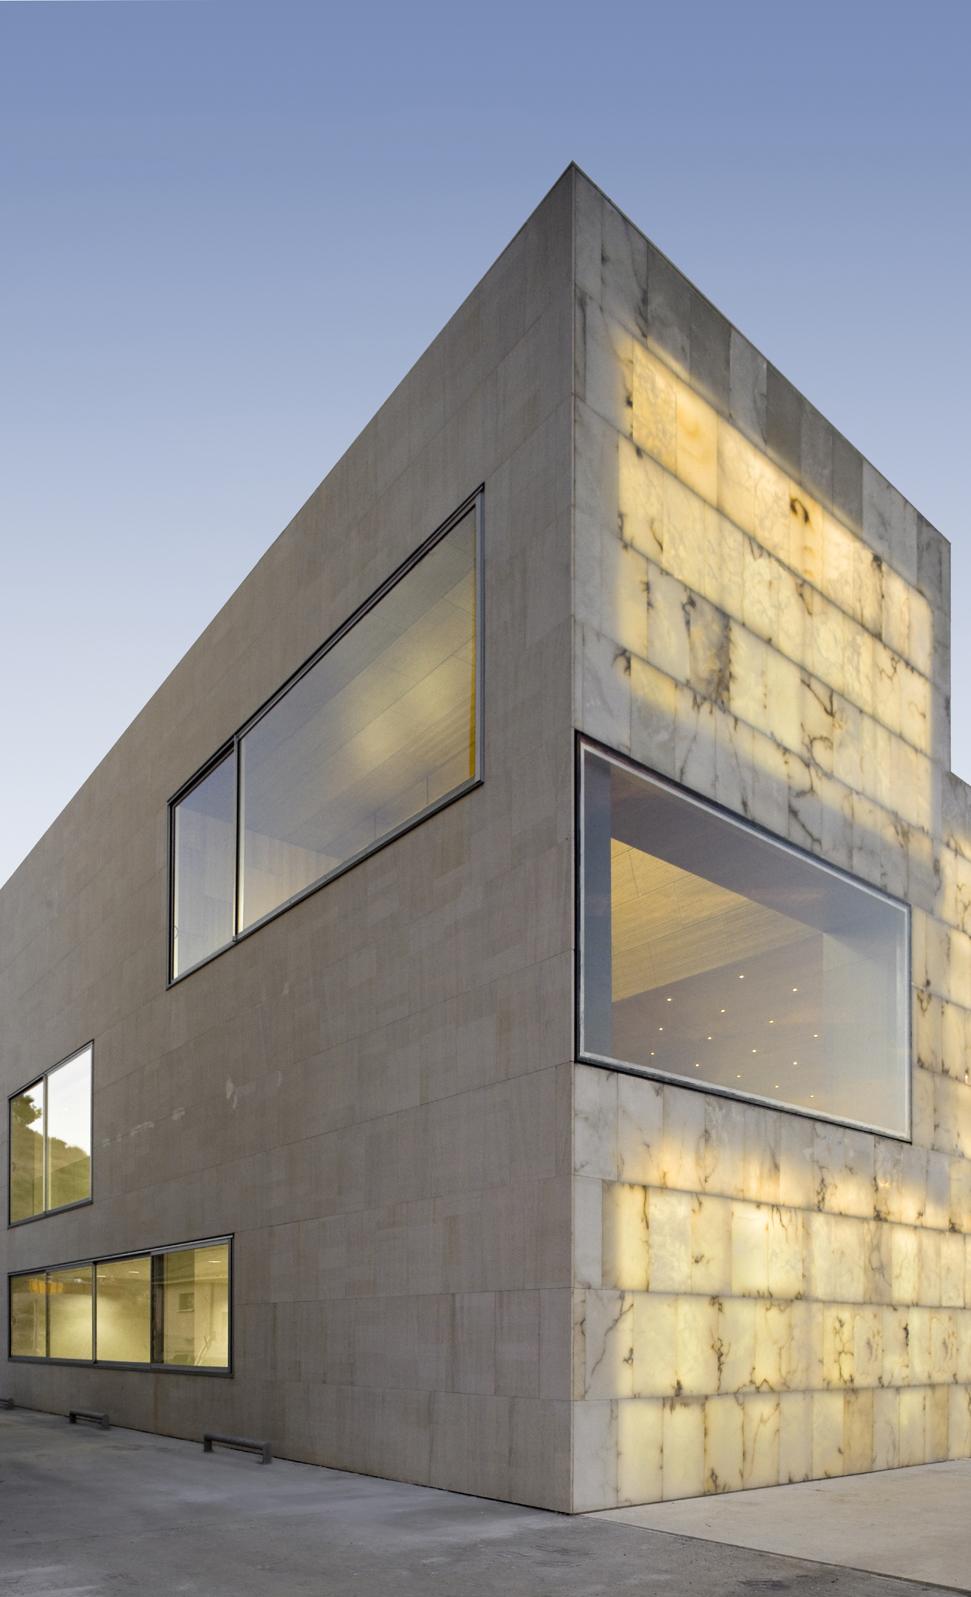 arquitectura zona cero: ARQUITECTURA EN DETALLE: MAGEN ... - photo#38